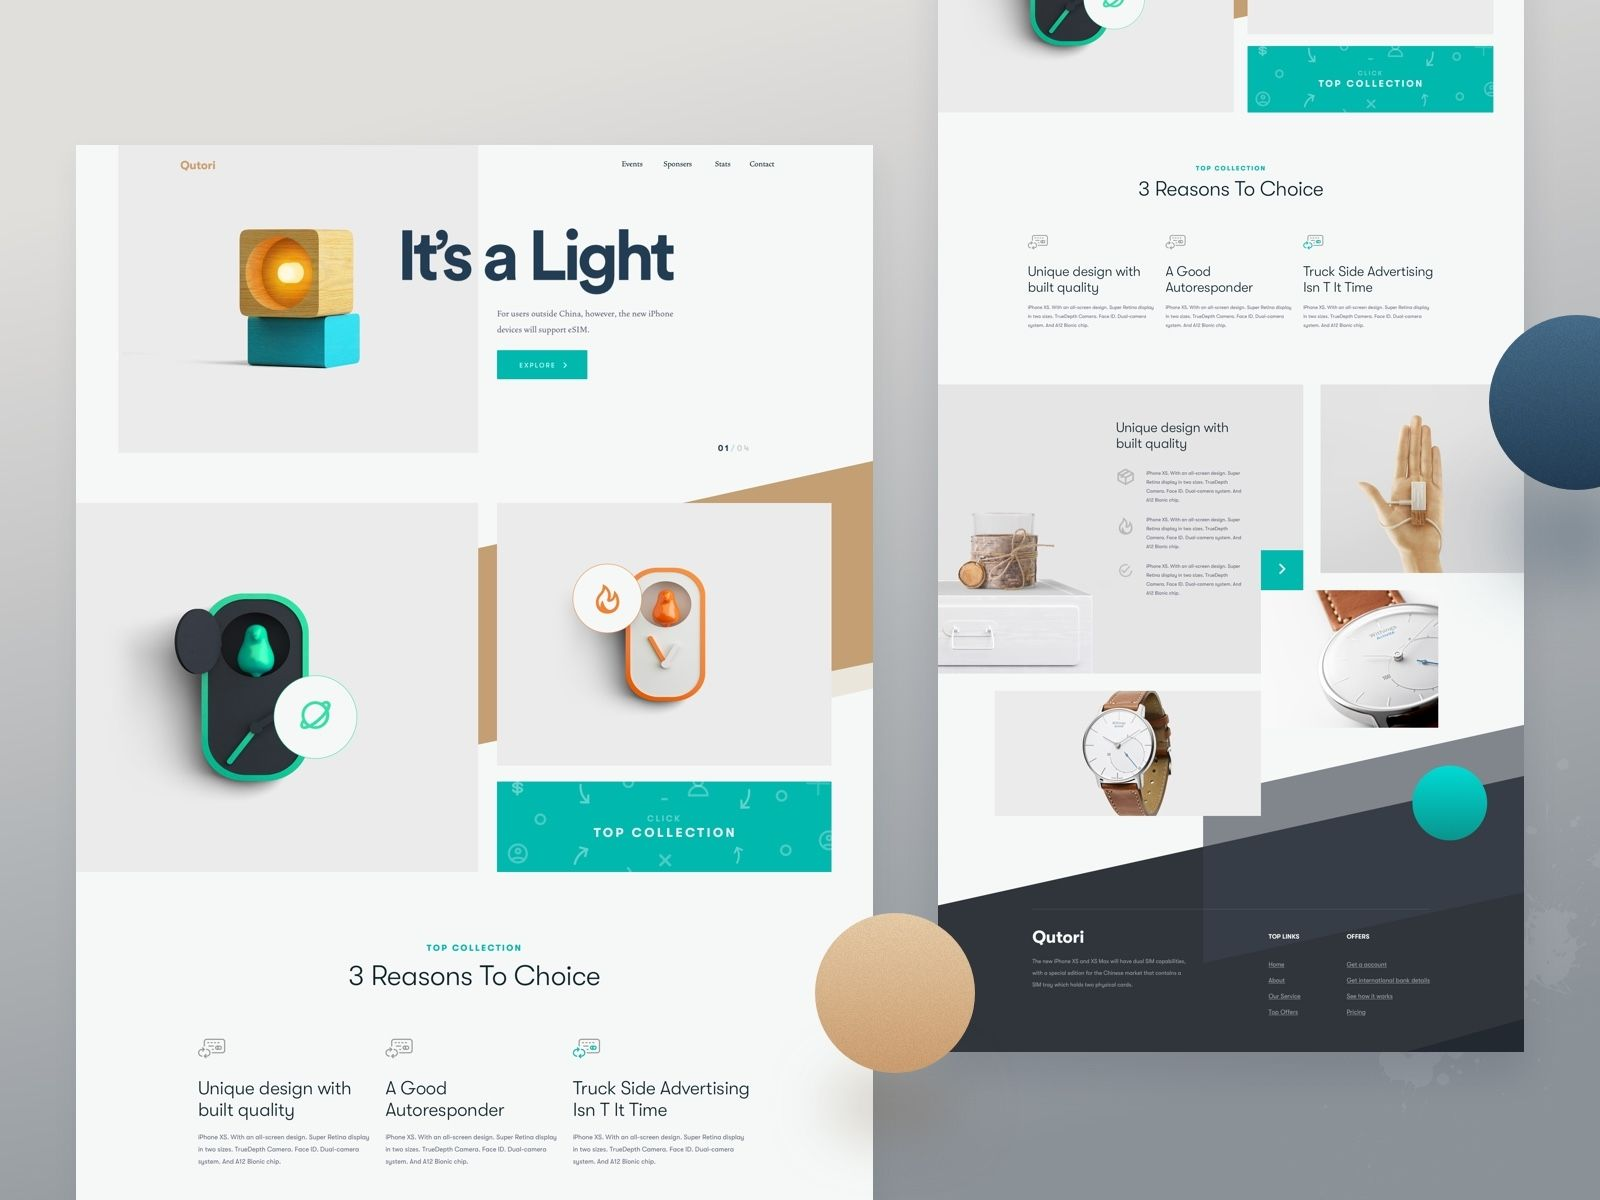 Creative Website Design For 2019 By Shekh Al Raihan Creative Website Design Web Layout Design Web Design Trends